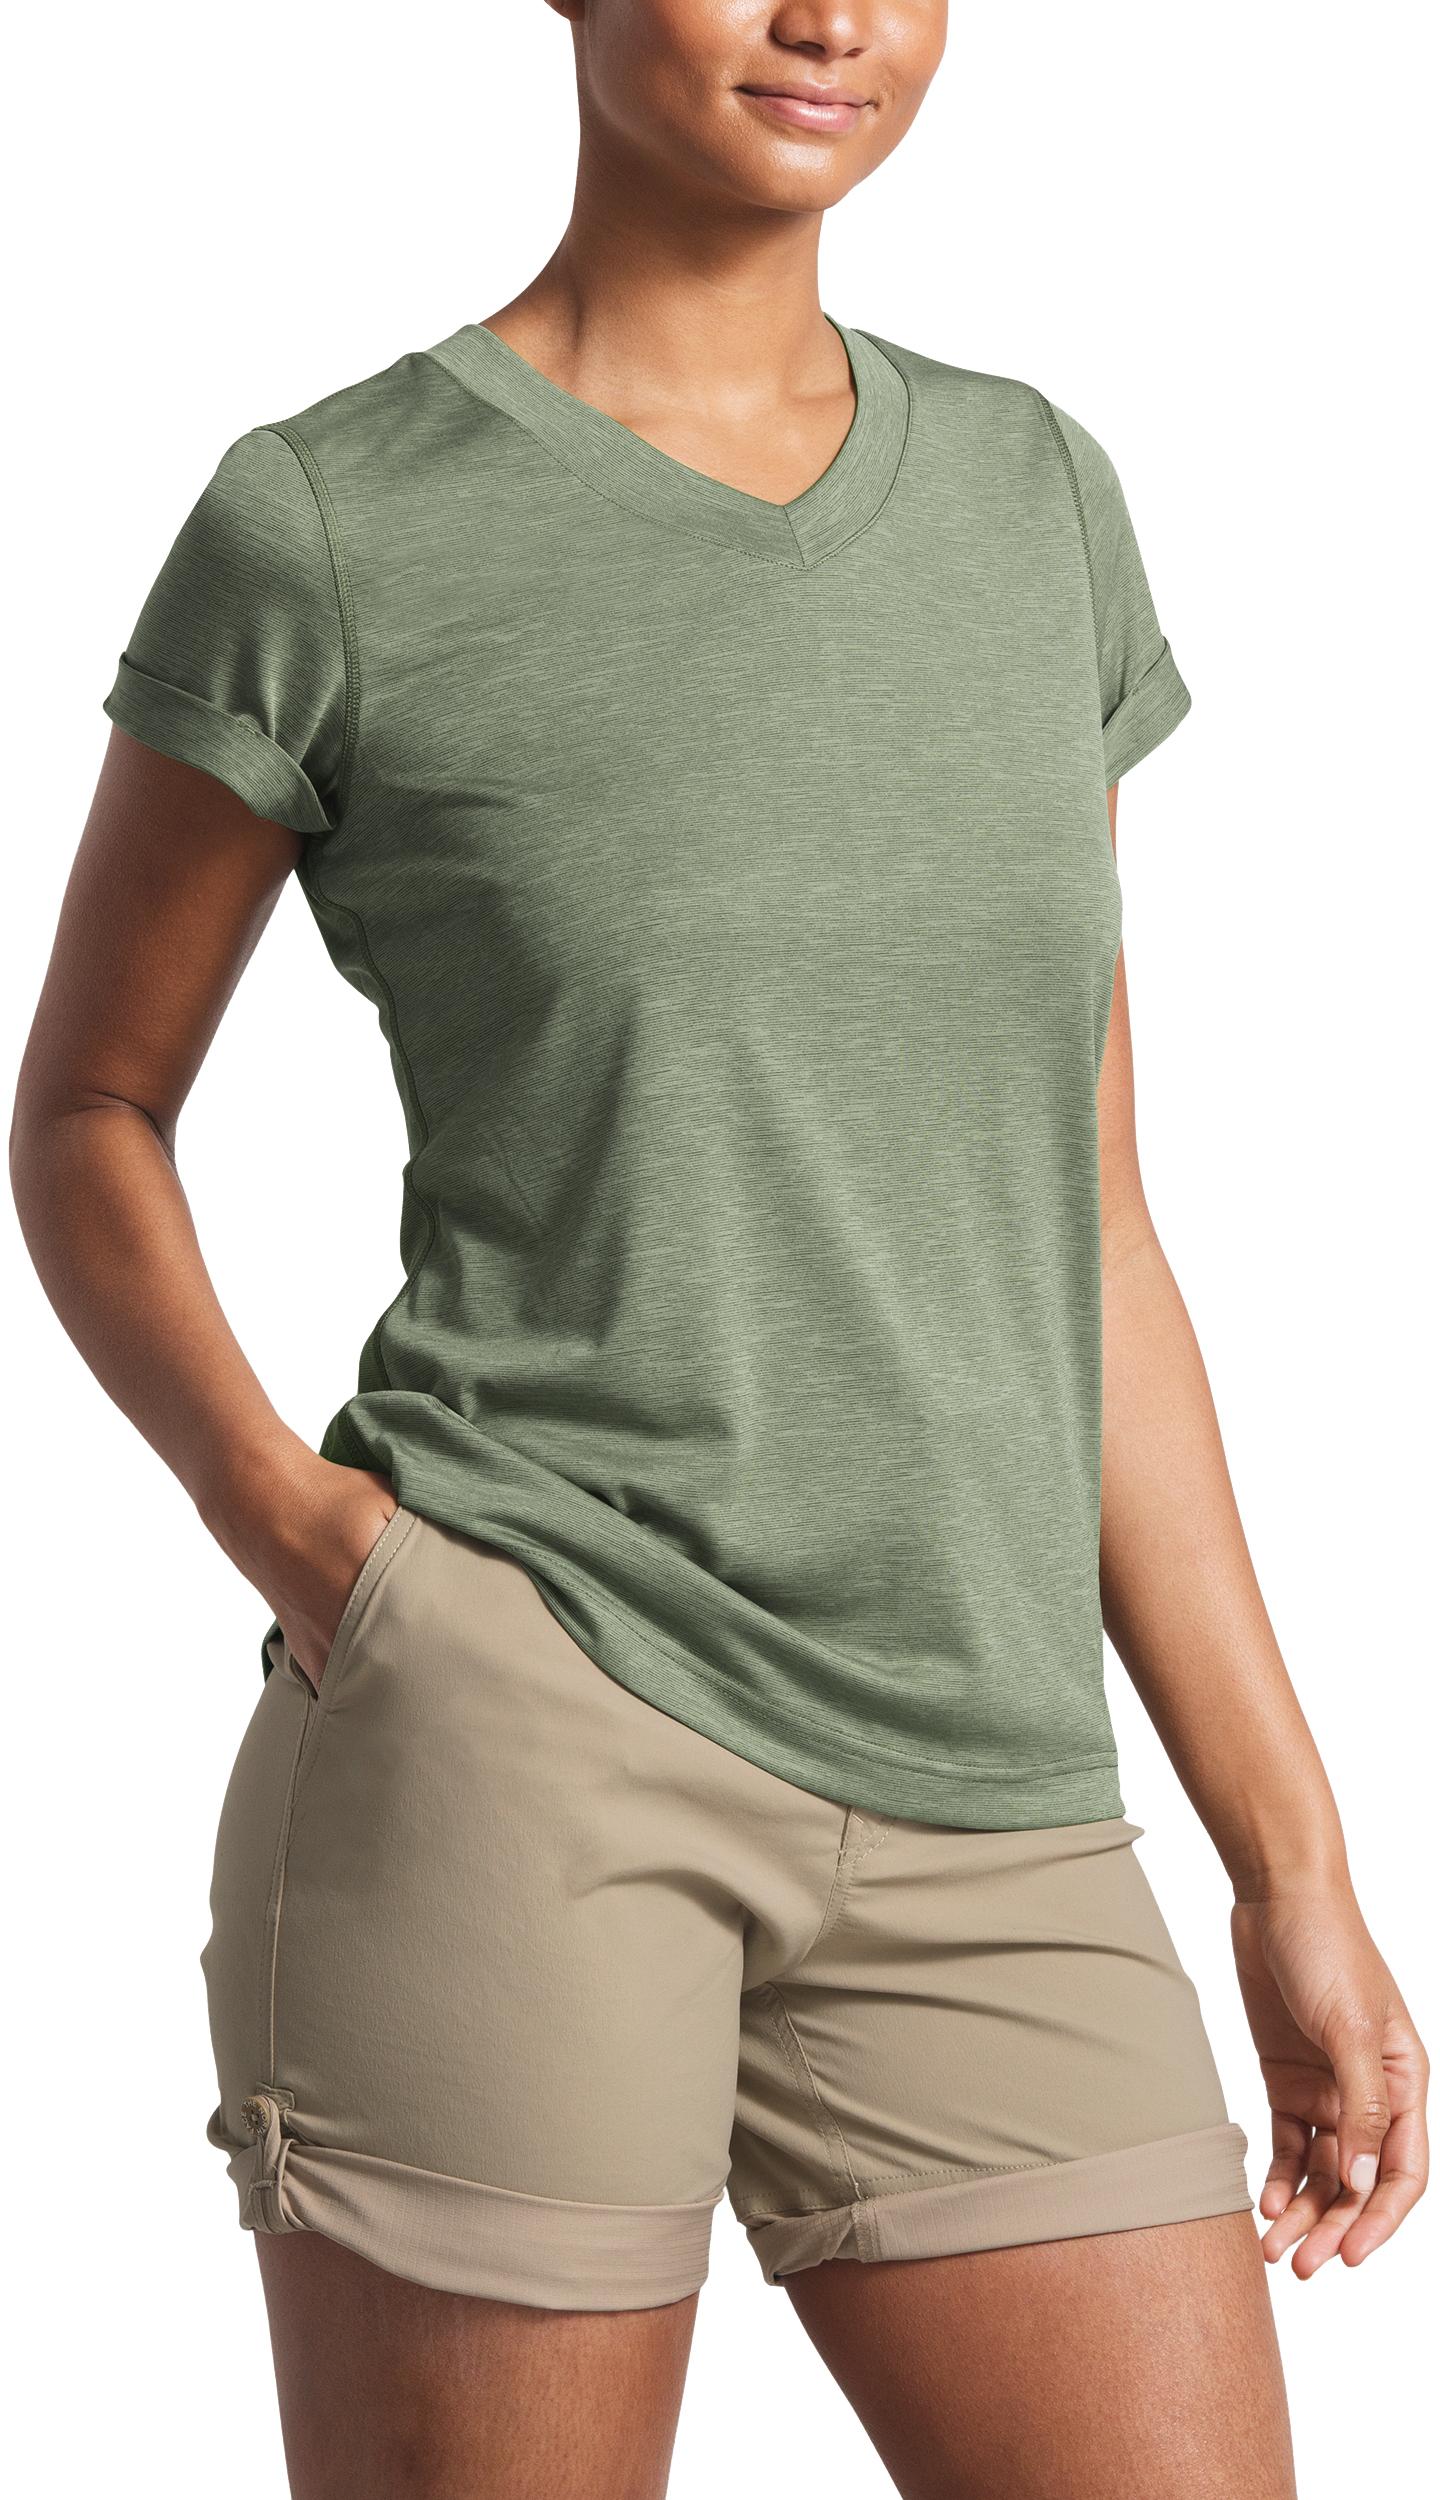 3992f3a50 The North Face HyperLayer FD Short Sleeve V-Neck - Women's | MEC